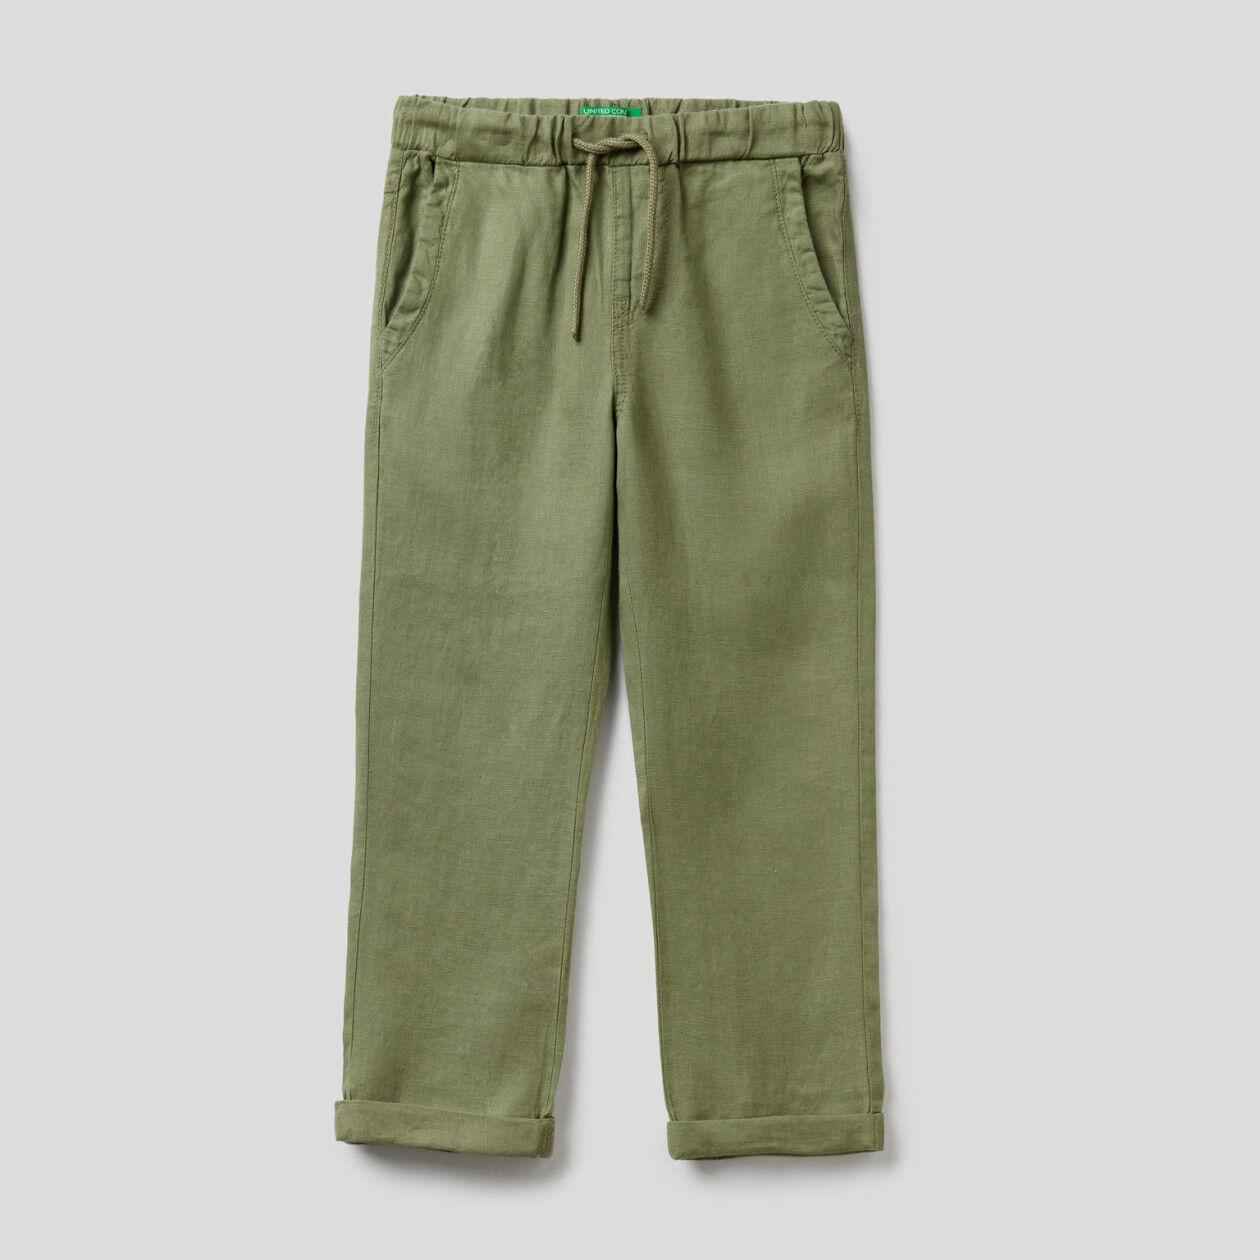 Pantalón de 100% lino con cordón de ajuste